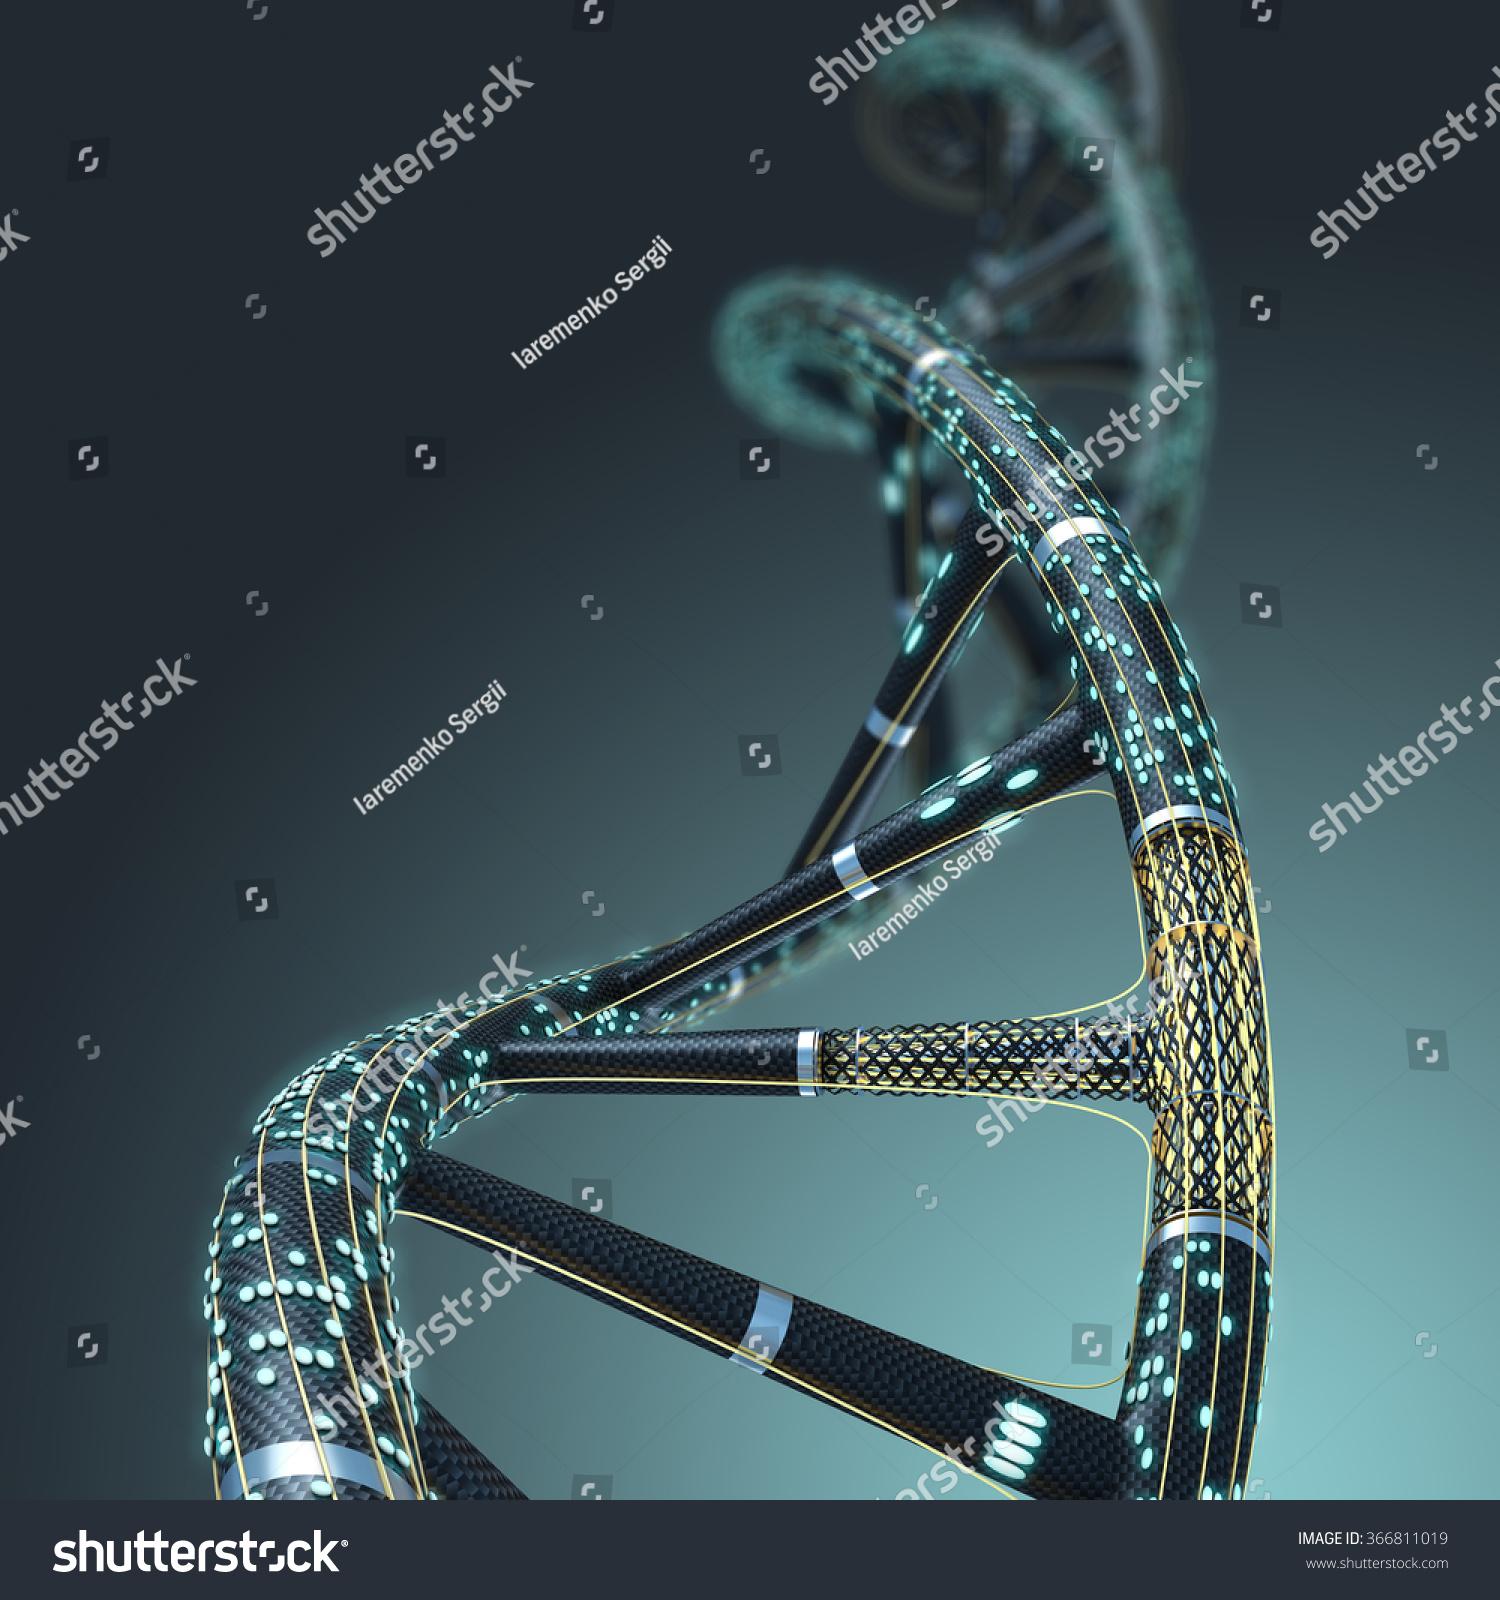 Dna Model Wallpaper: Artificial Dna Molecule Concept Artificial Intelligence